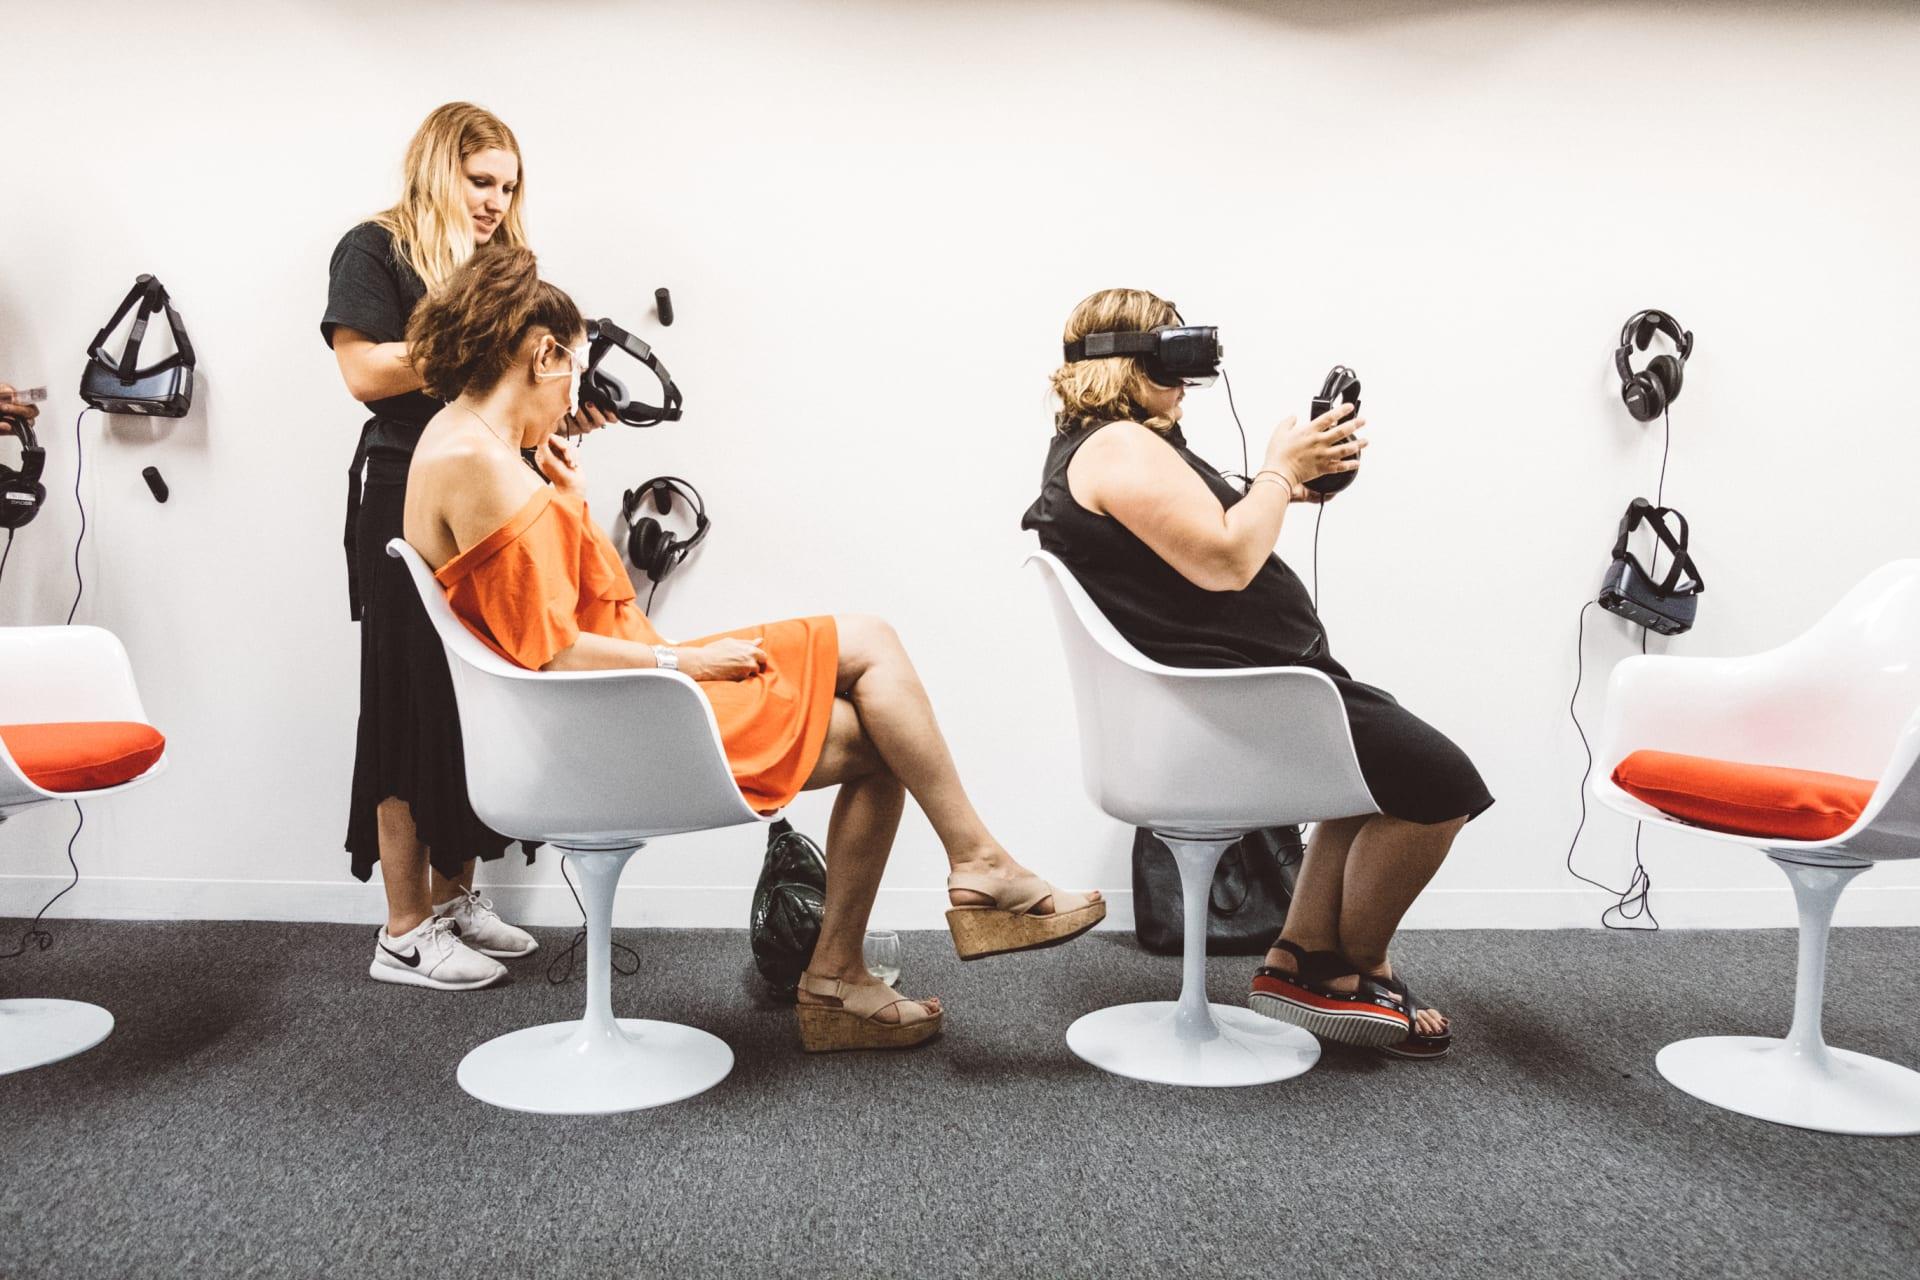 Copy of VR World Openingt 2017 Kenny Rodriguez 0633